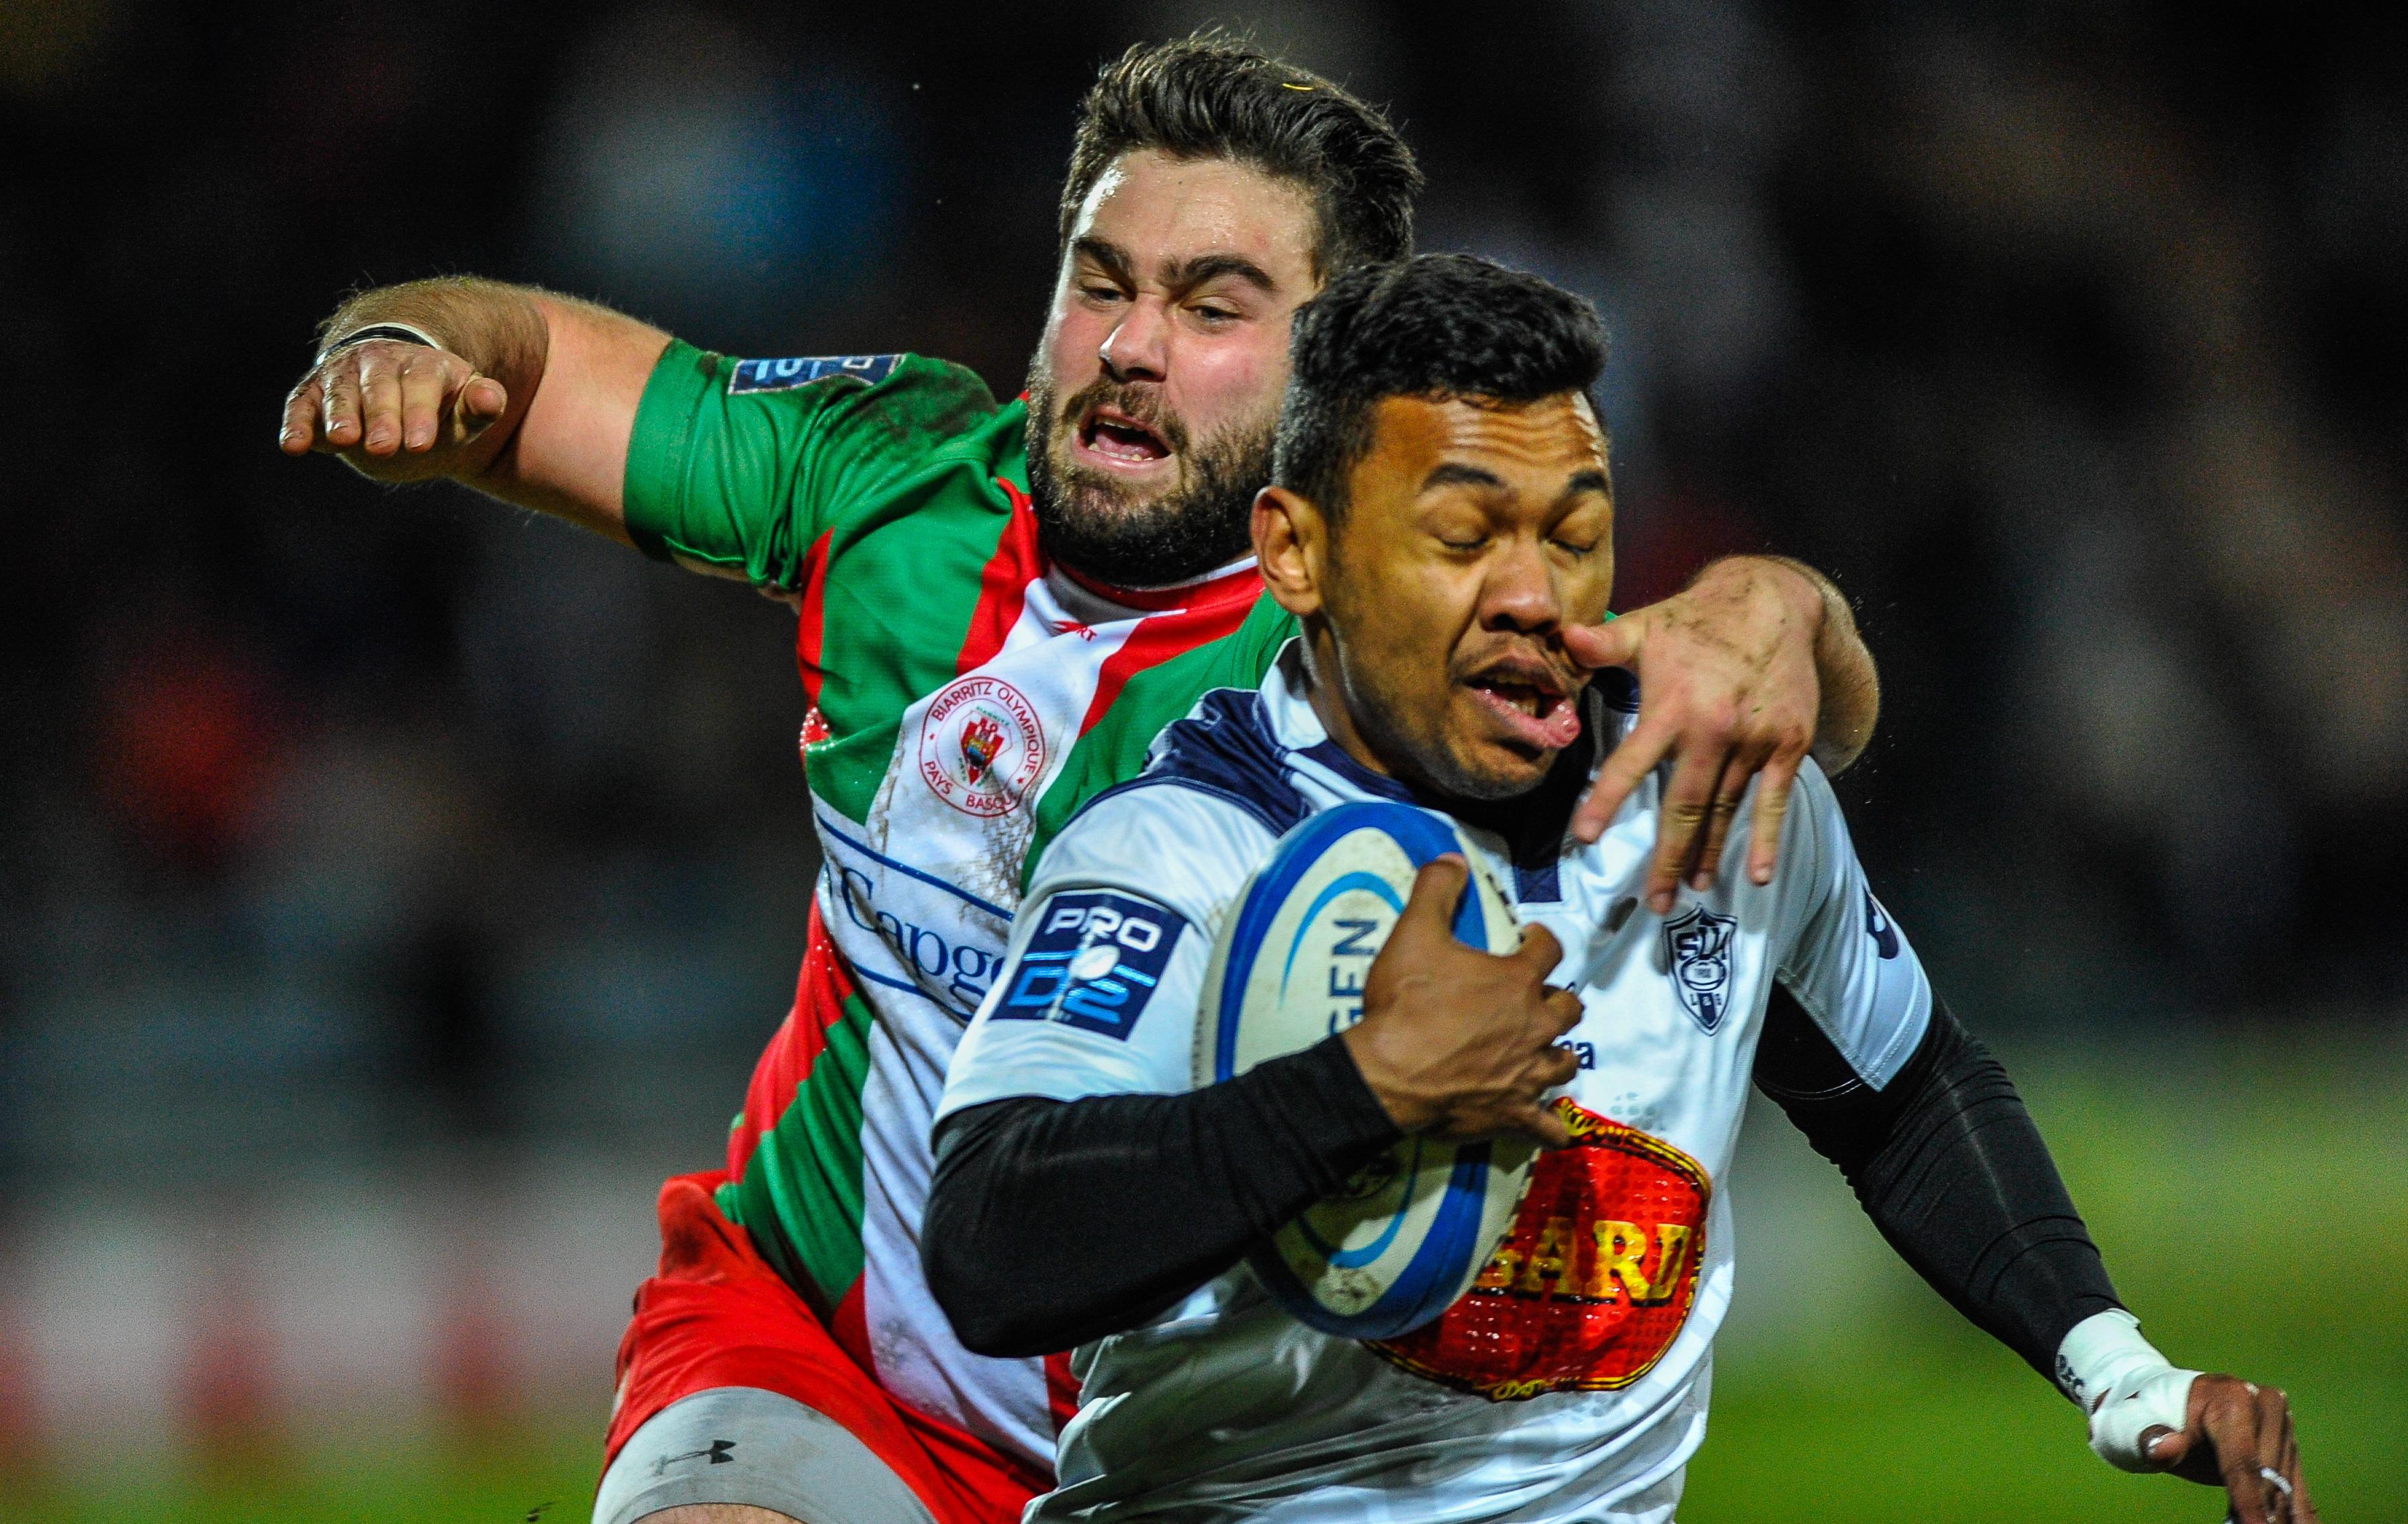 Rugby - Pro D2 - Pro D2 : Mont-de-Marsan s'installe, Biarritz replonge